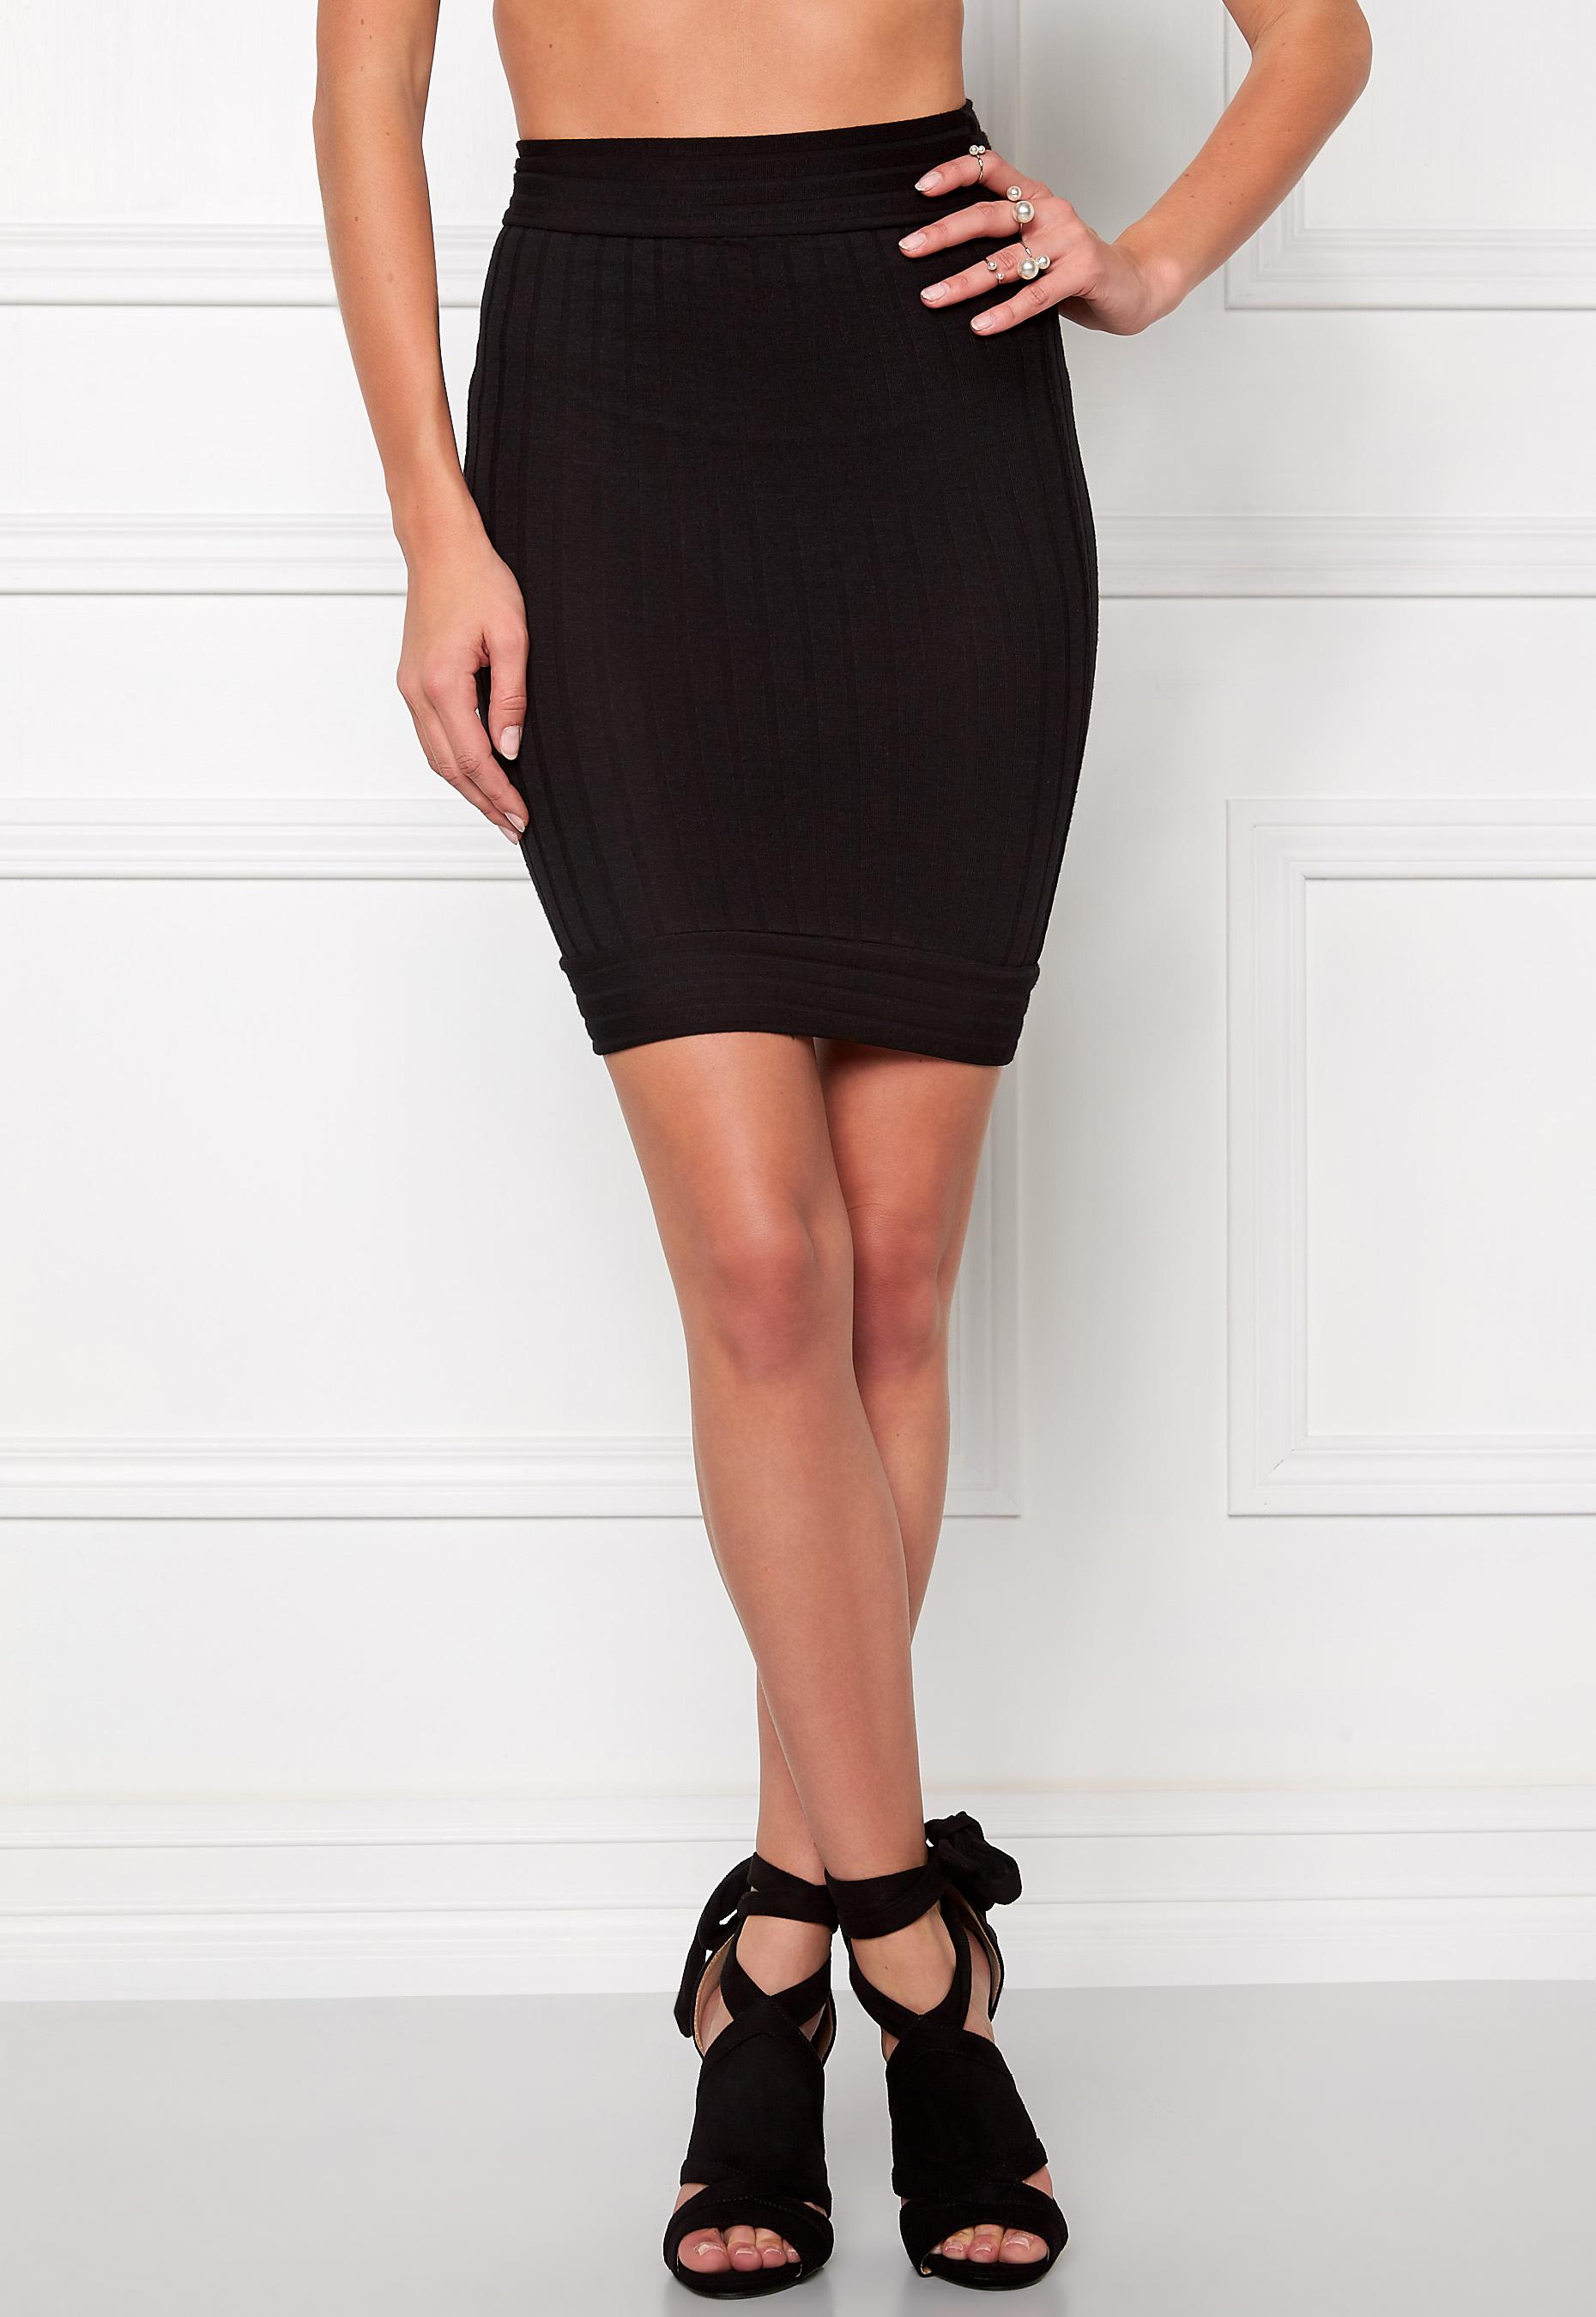 Make Way Ruby Skirt Black - Bubbleroom bf0c23802cdfb